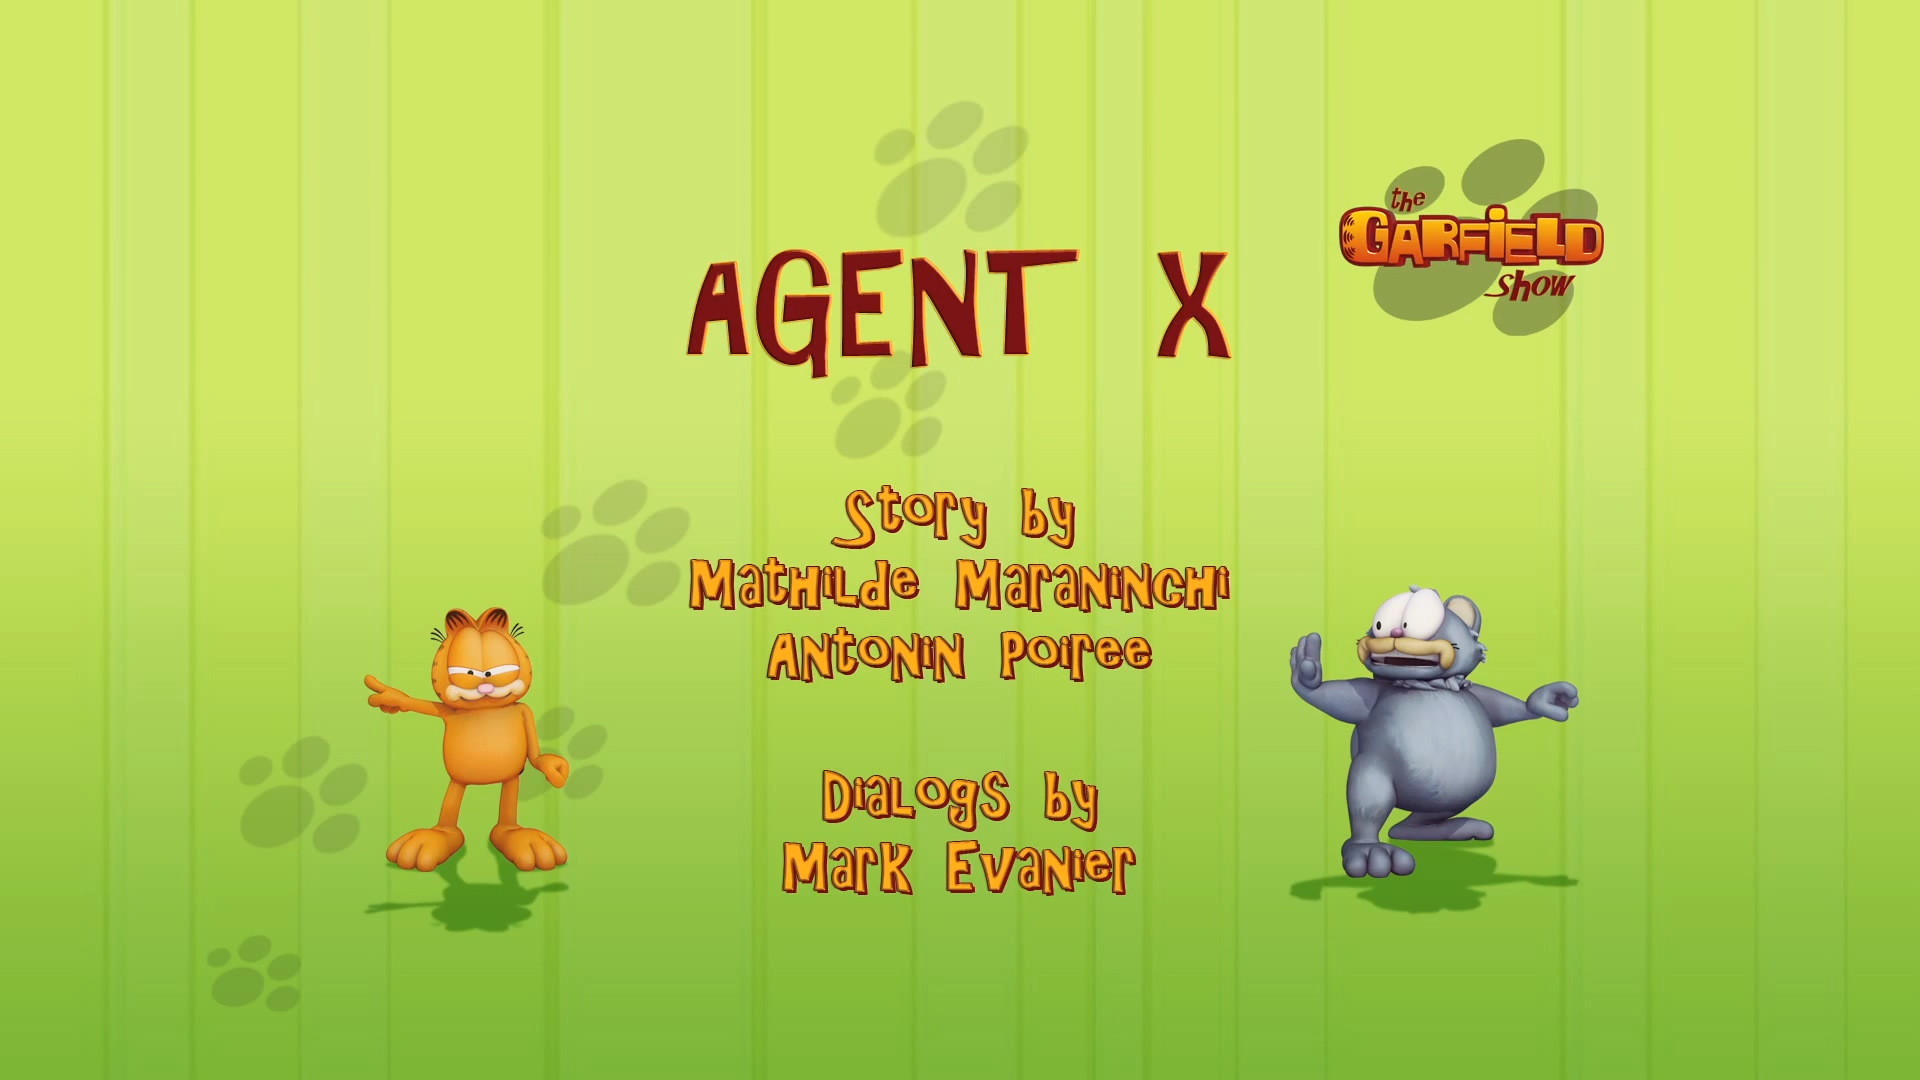 Agent X (episode)